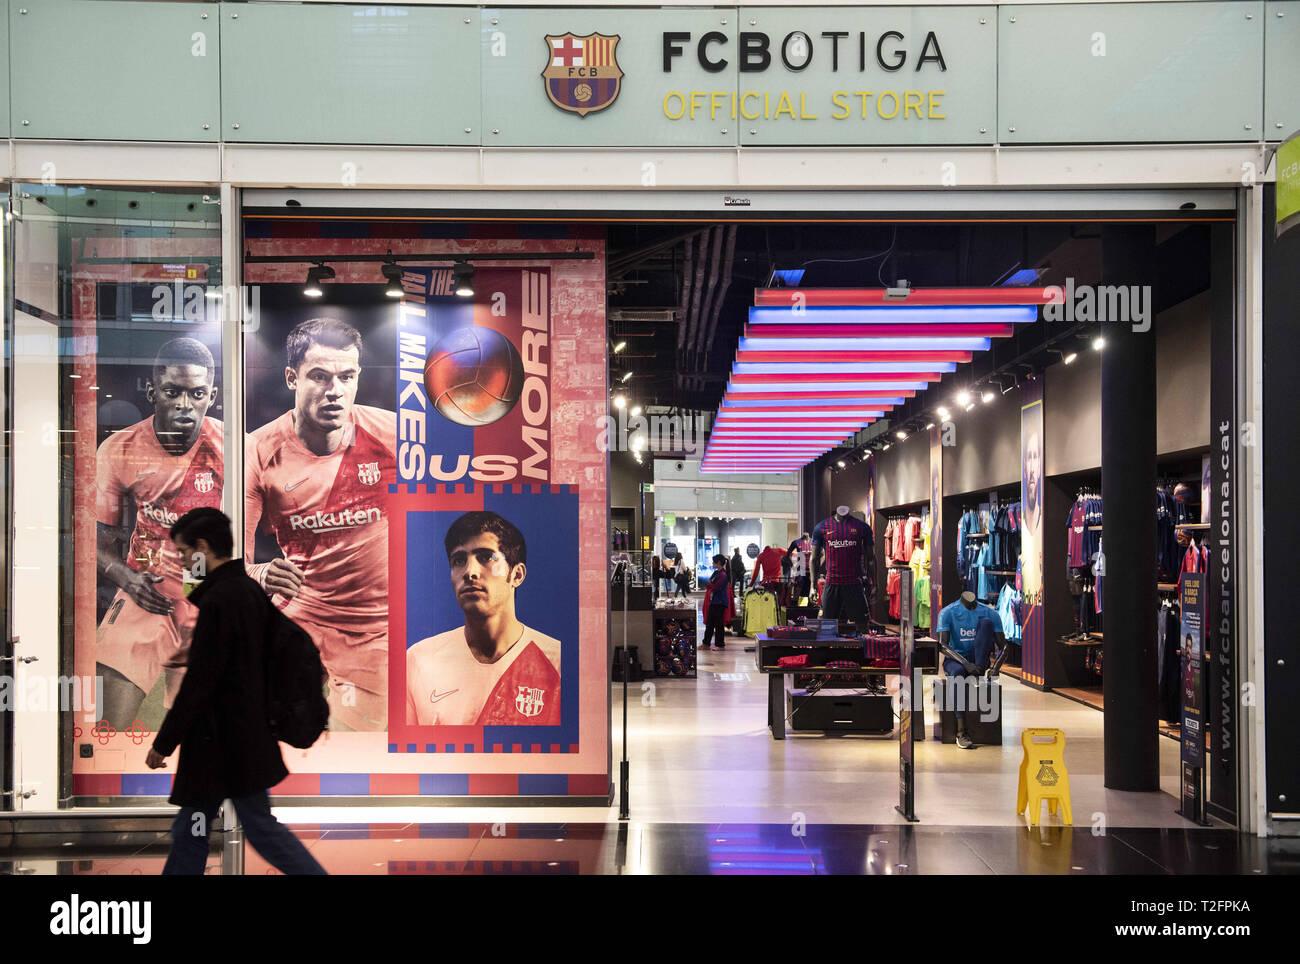 Barcelona, Spain. 7th Mar, 2019. A man seen passing near a Futbol Club Barcelona brand store at Barcelona's El Prat Josep Tarradellas airport. Credit: Budrul Chukrut/SOPA Images/ZUMA Wire/Alamy Live News - Stock Image